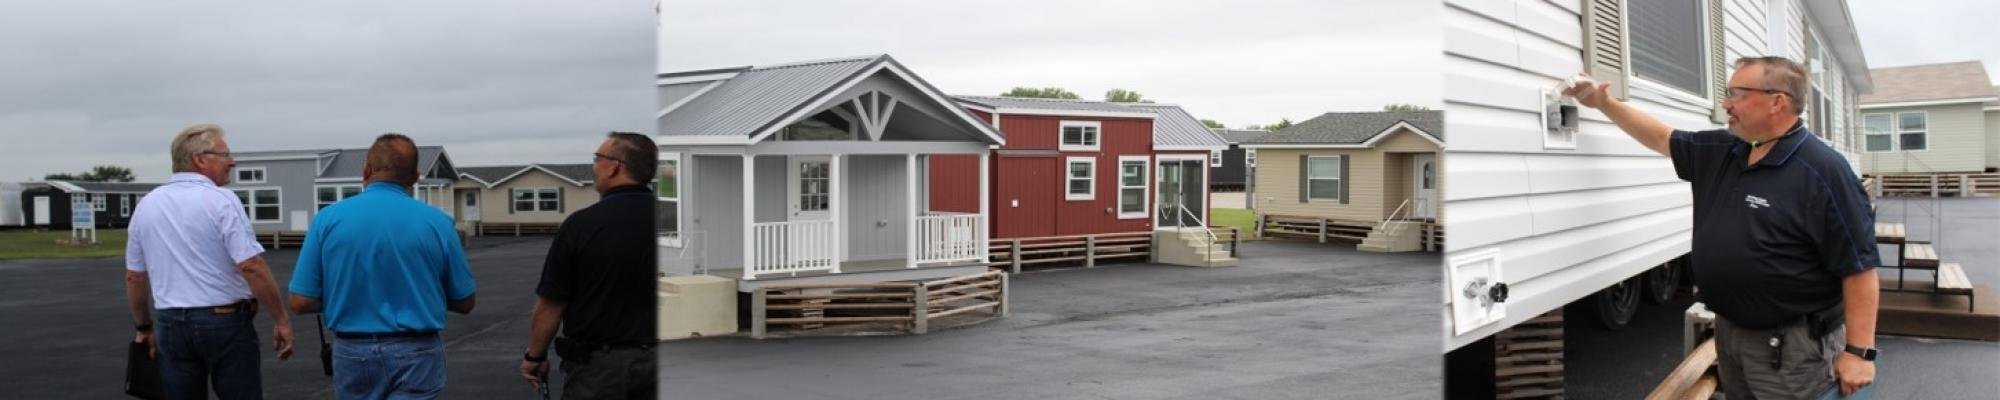 HousingCollage-4